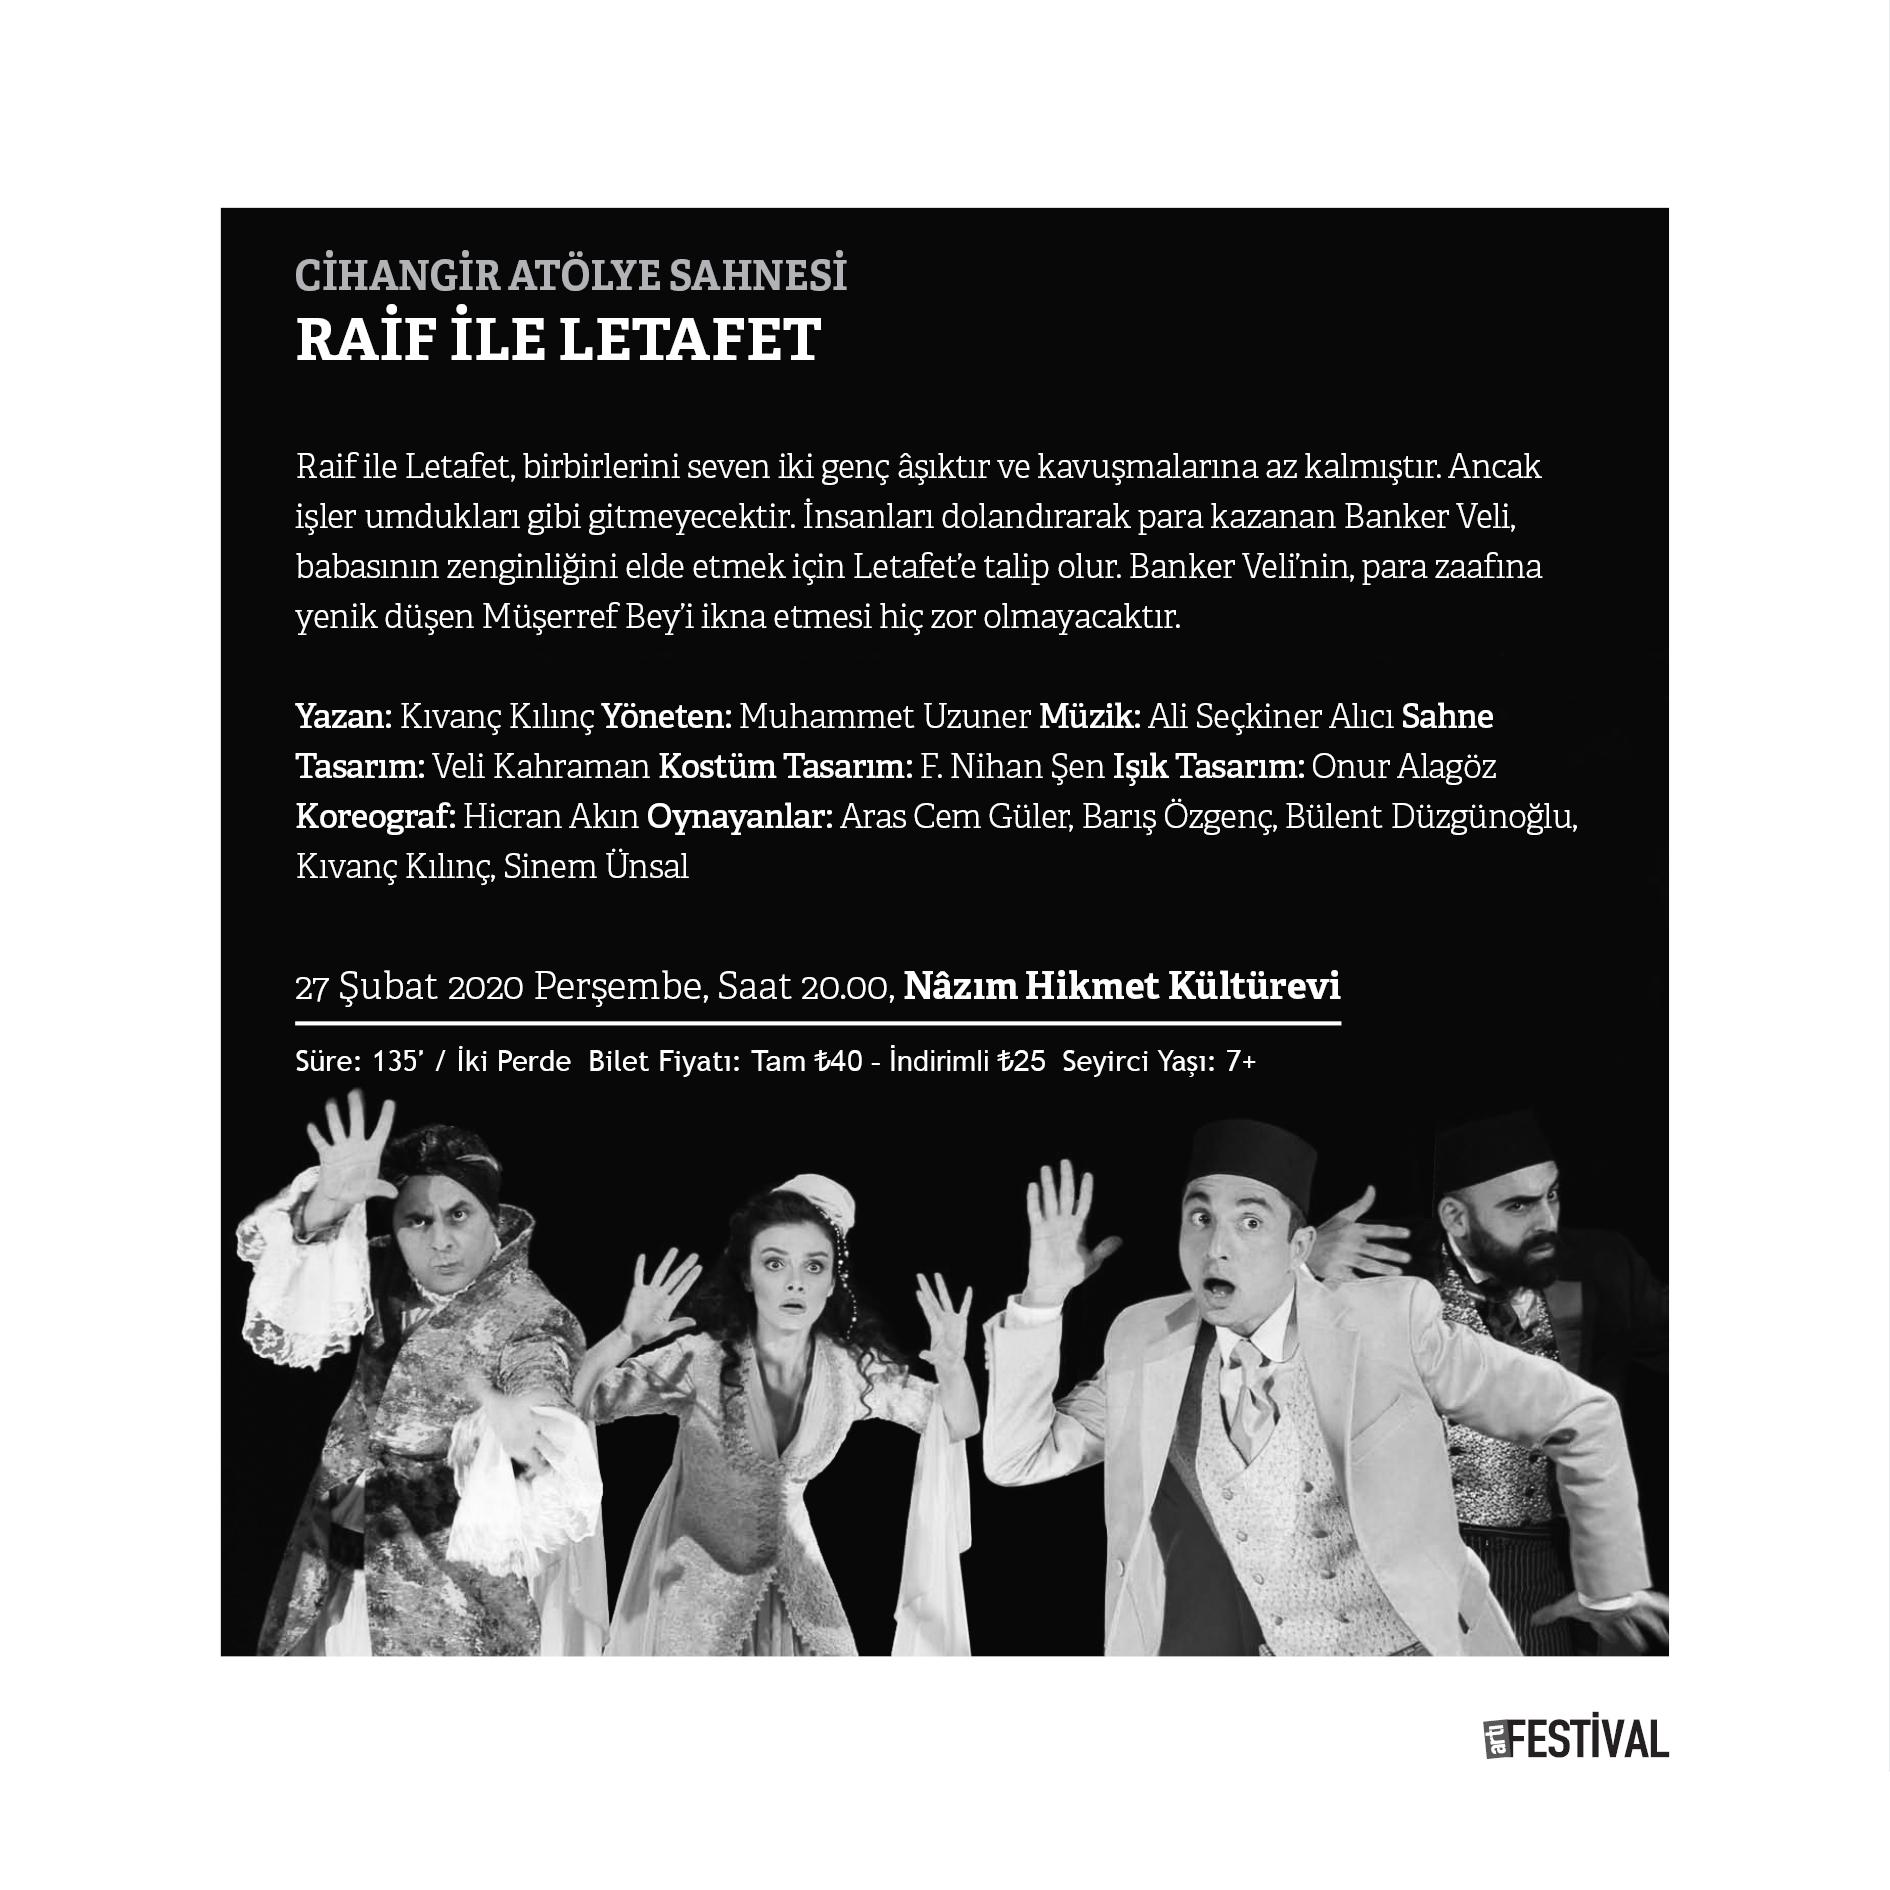 Raif ile Letafet | artı Festival